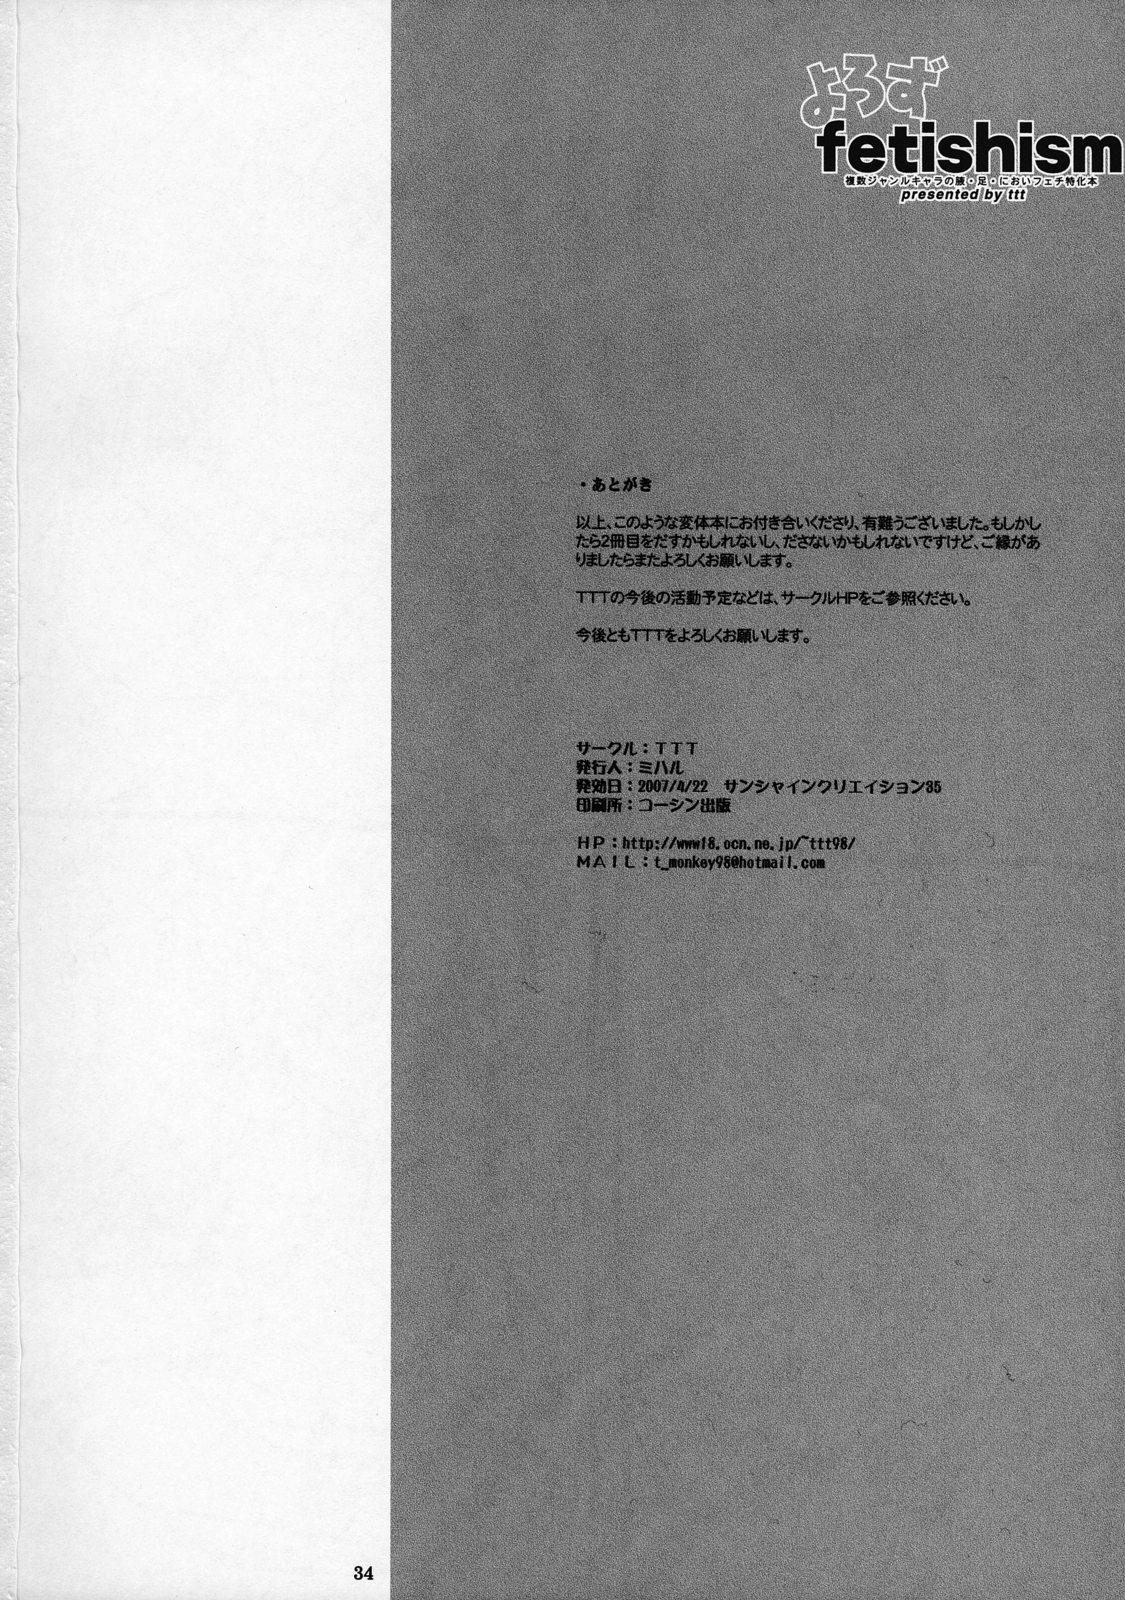 Yorozu fetishism 32